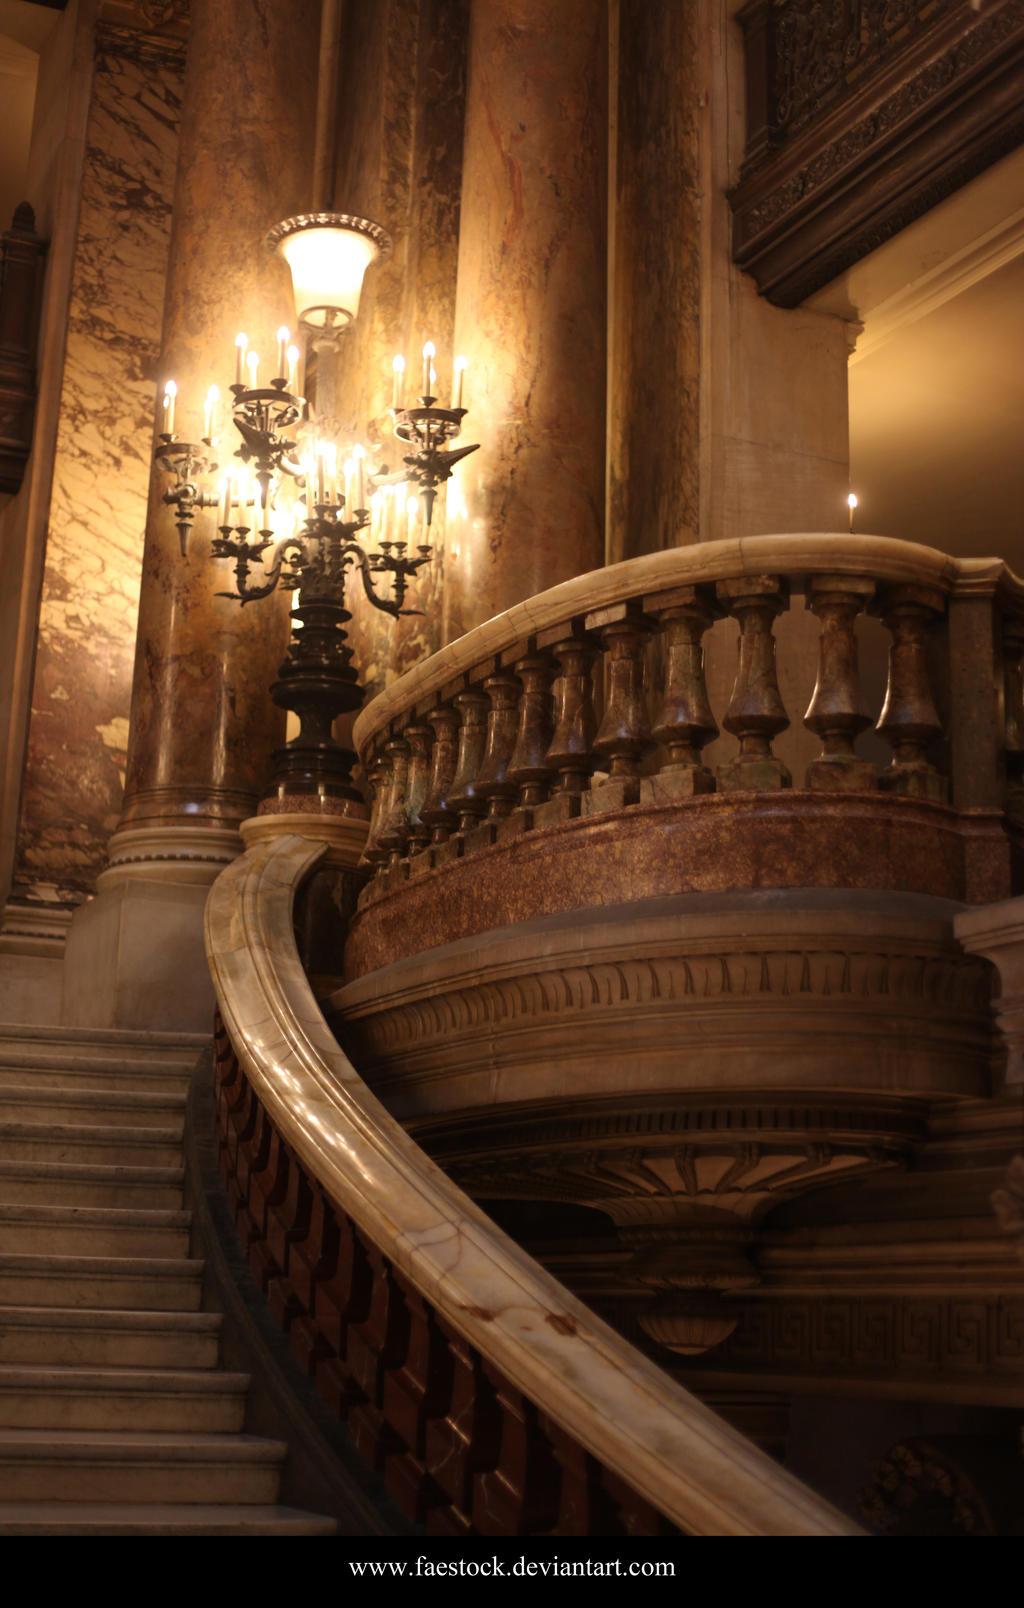 Paris Opera House16 by faestock